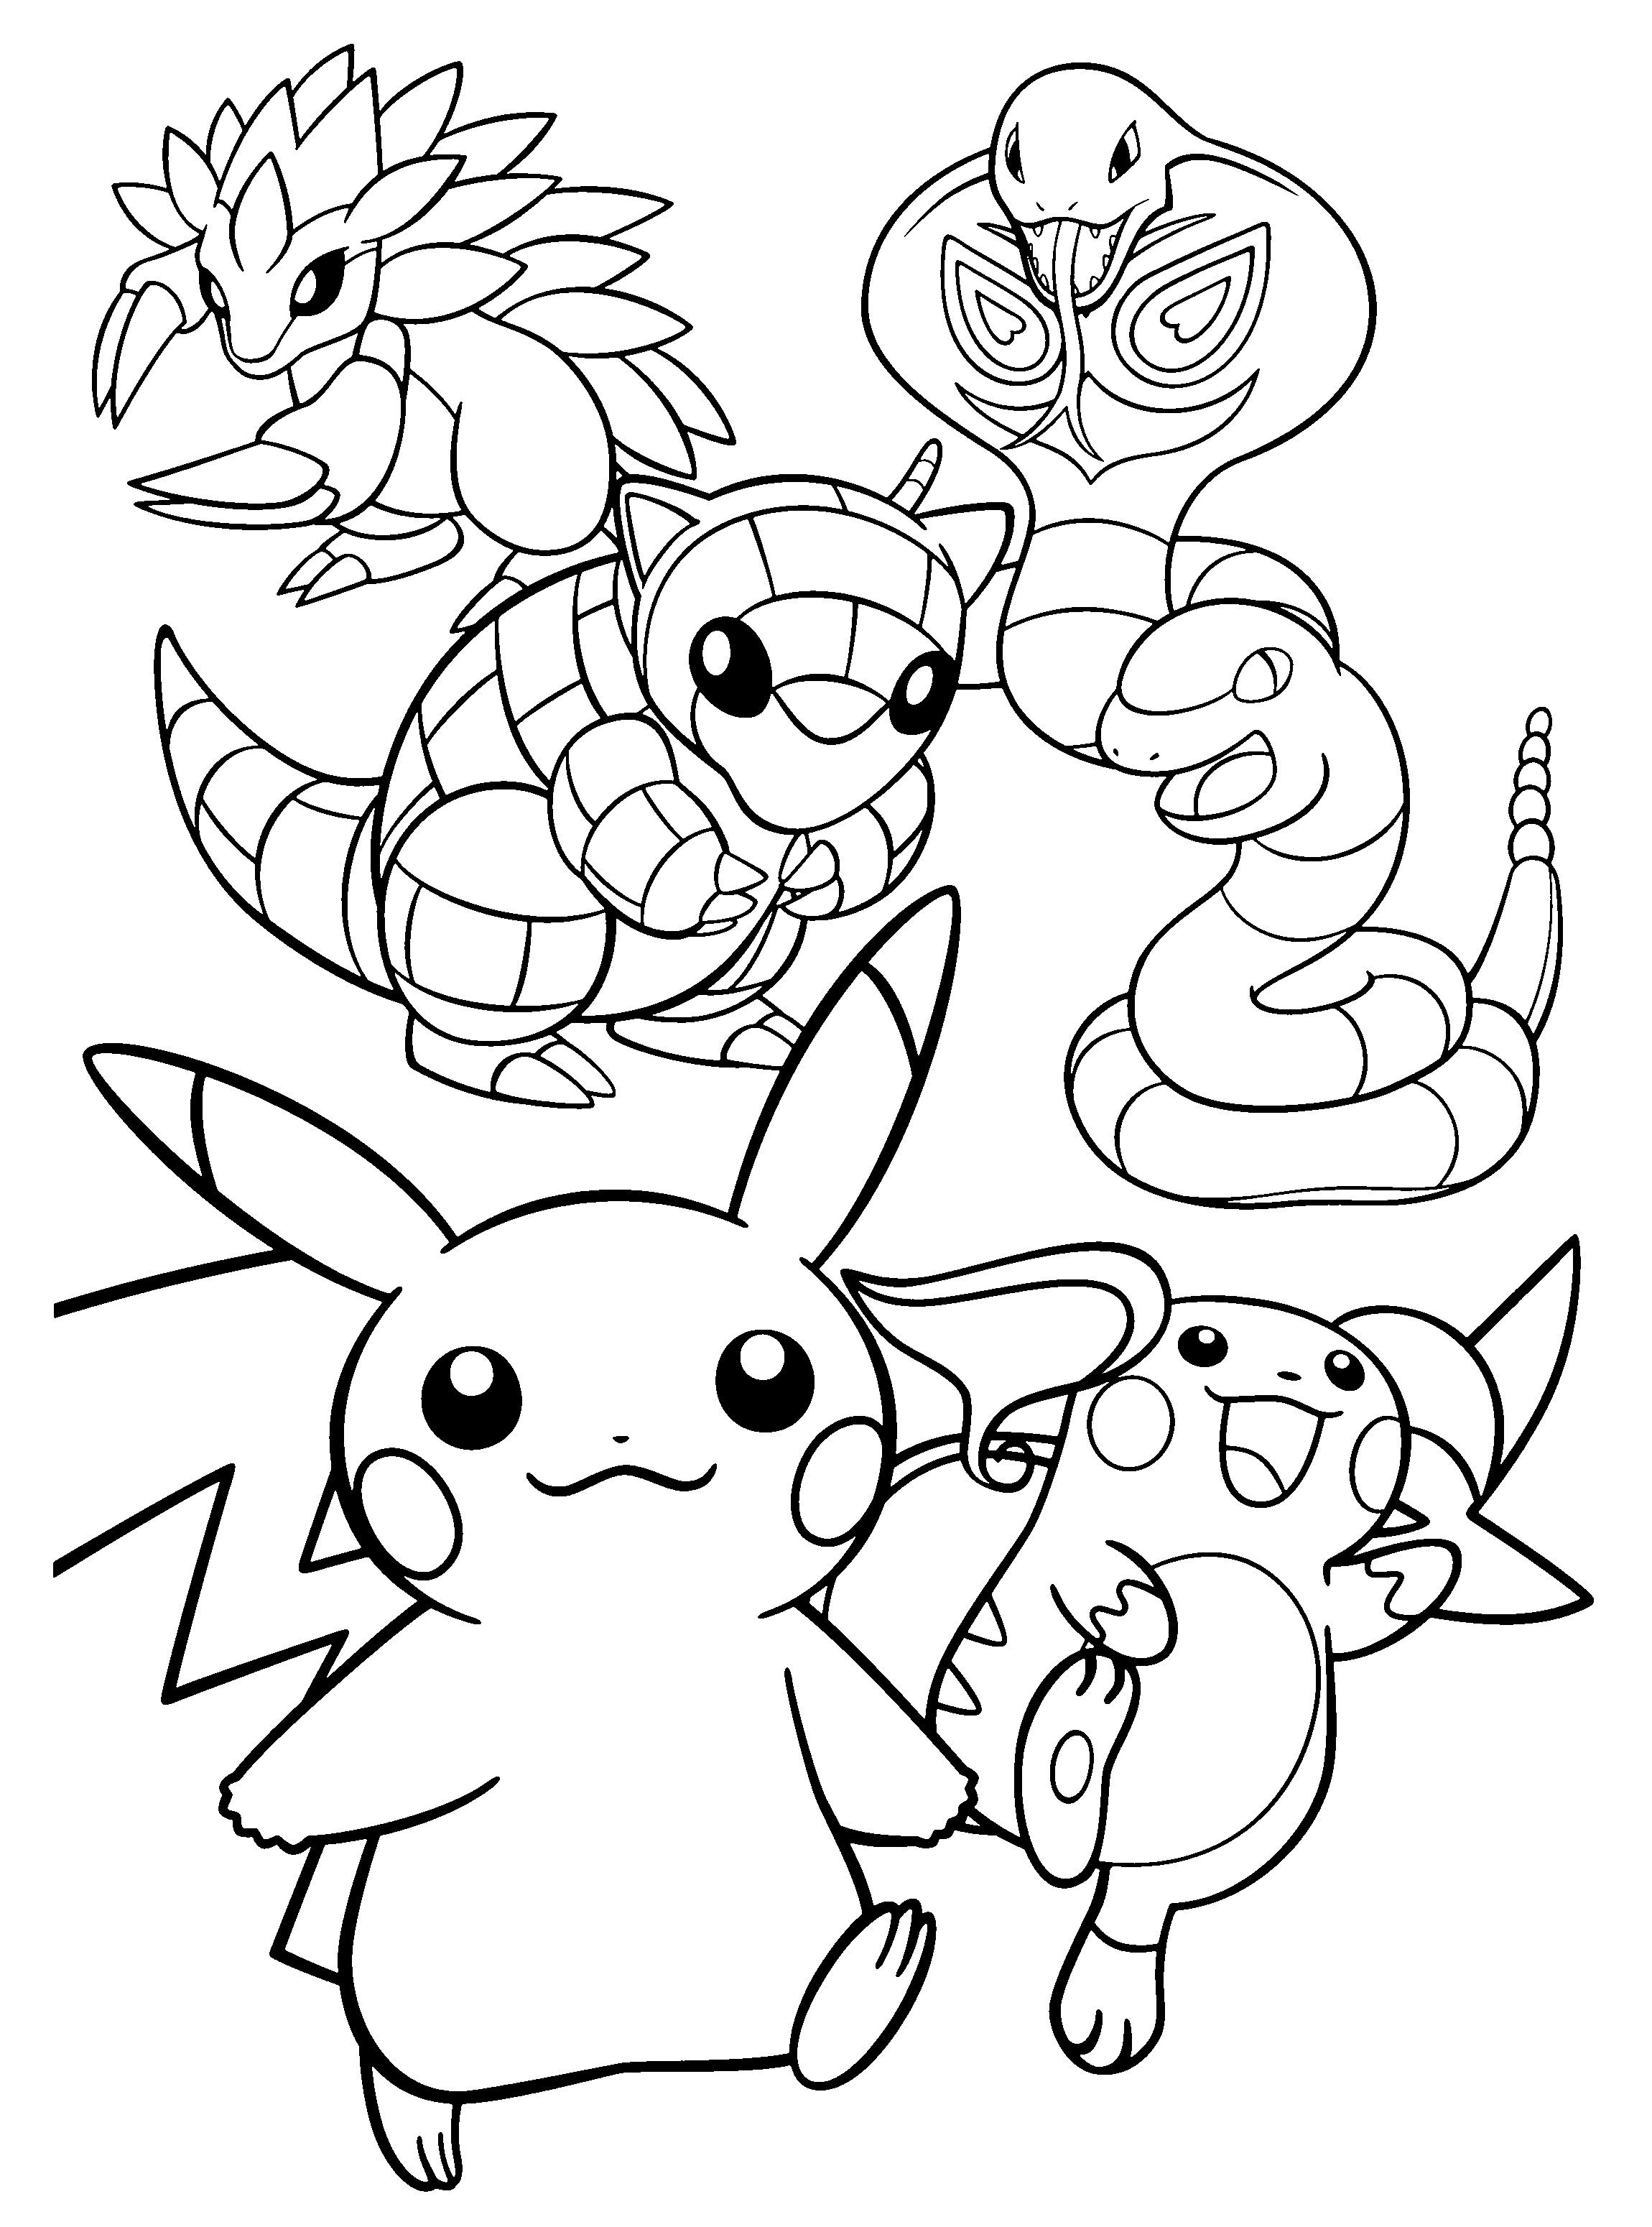 Pokemon Go Pikachu Raichu Sandshrew Sandslash Arbok And Ekans Coloring Pages In 2021 Pokemon Coloring Pages Pokemon Coloring Coloring Pages